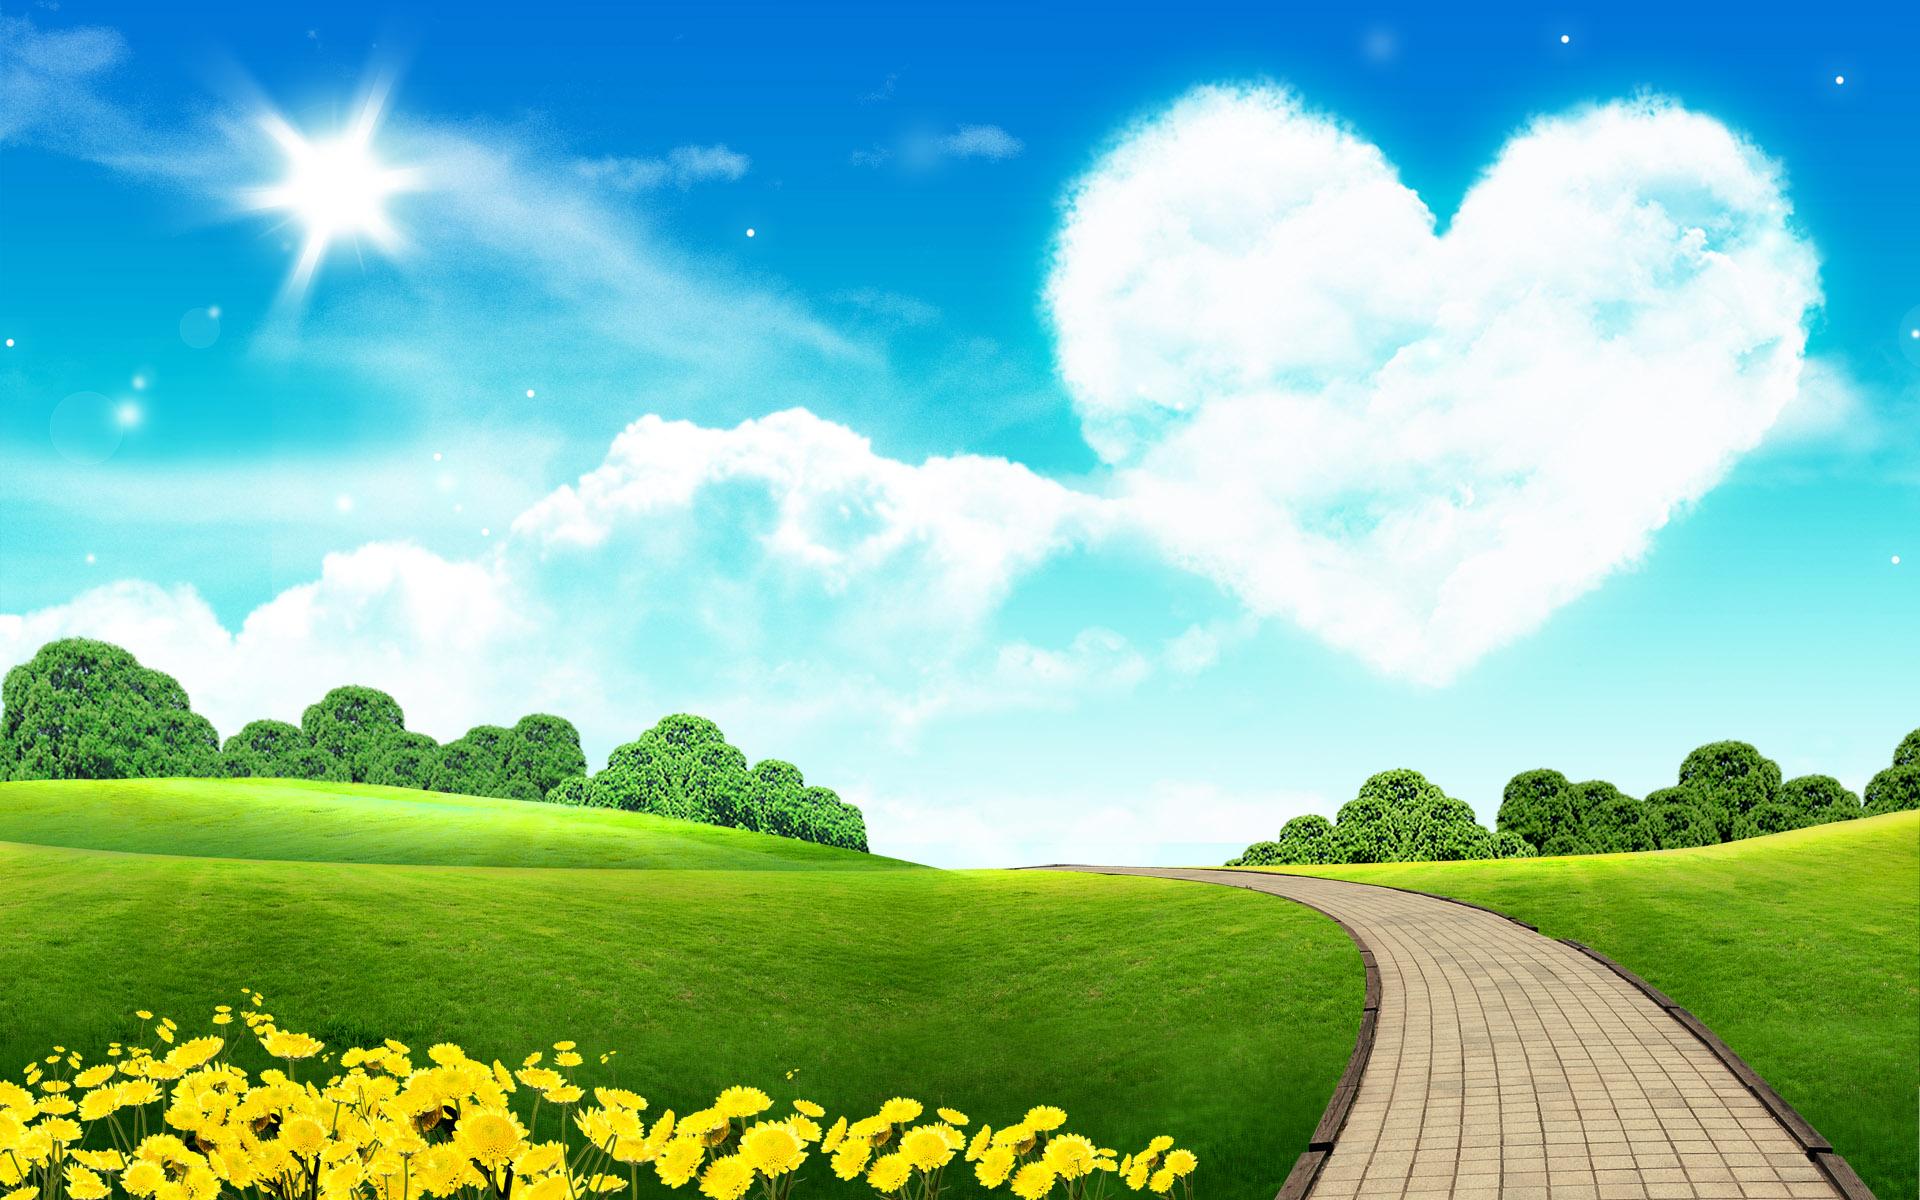 scenery wallpaper includes -#main